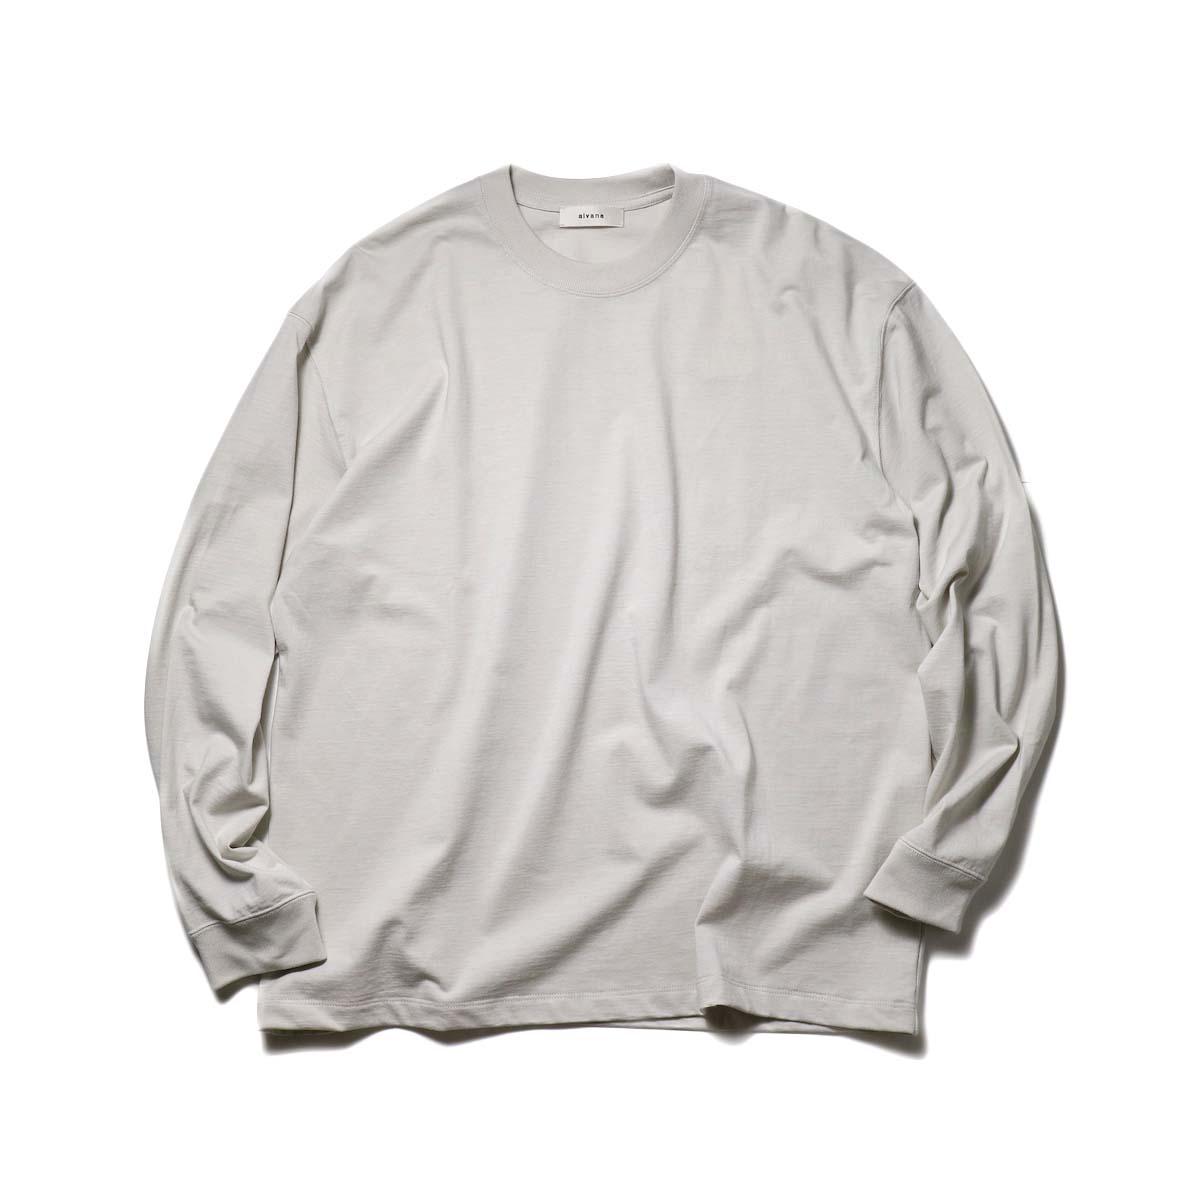 alvana / TANGUIS L/S TEE SHIRTS (Ecru Gray)